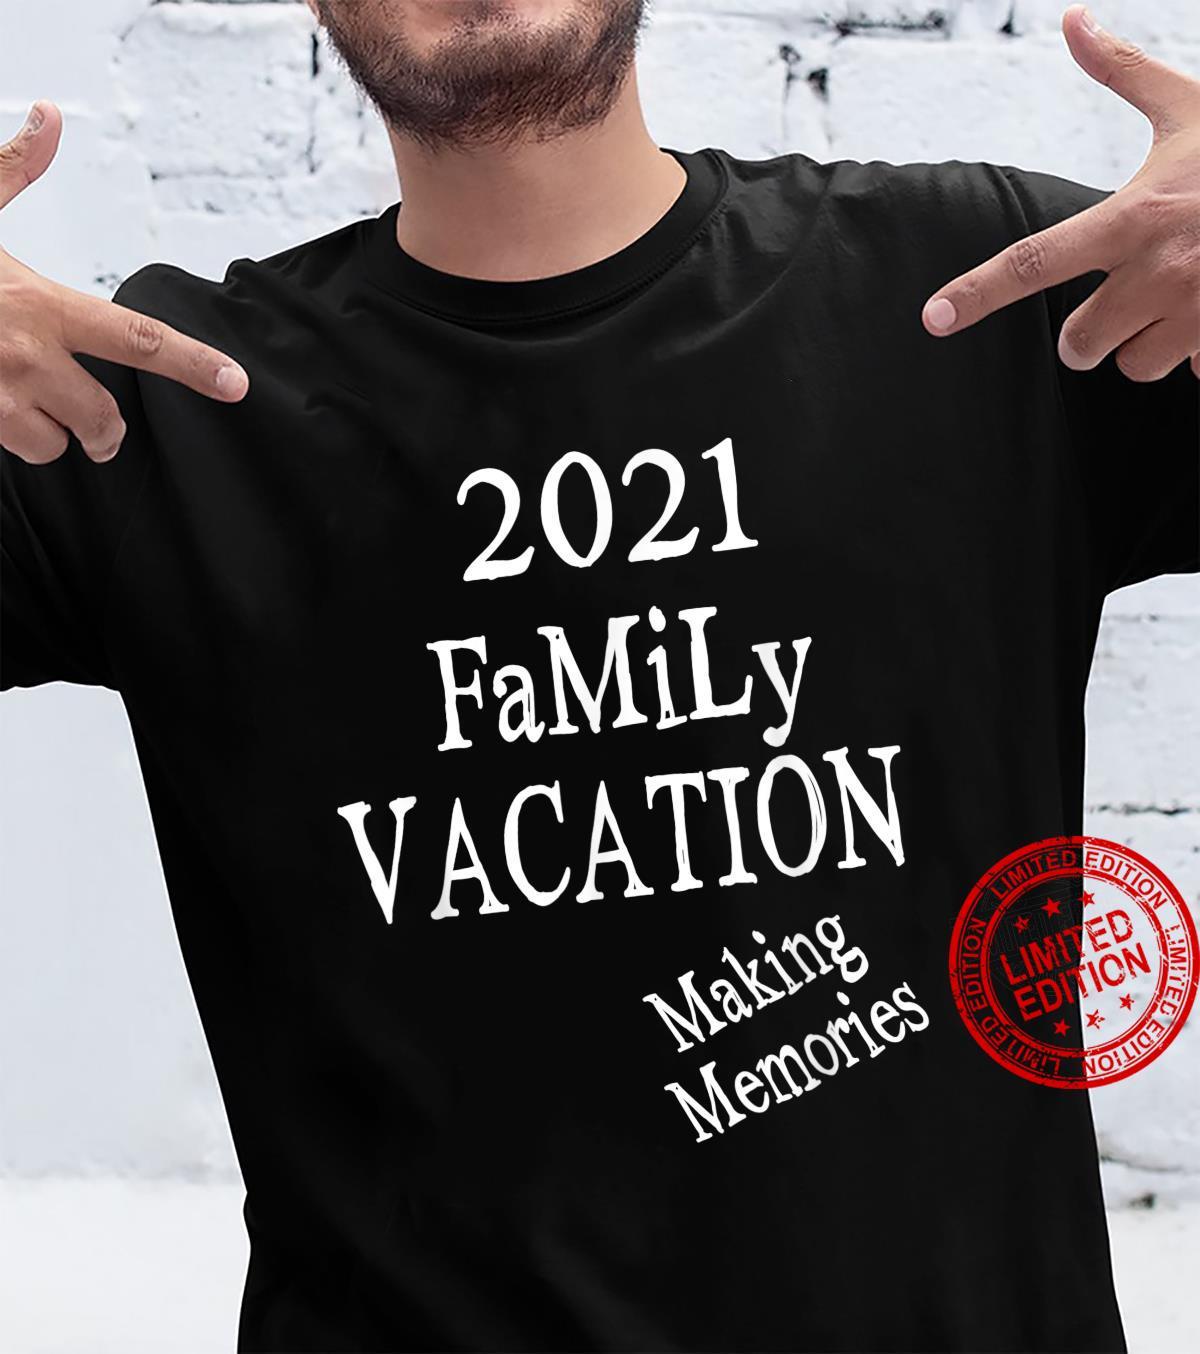 Family Vacation Making Memories, Love Family, Mom, Dad, Son Shirt